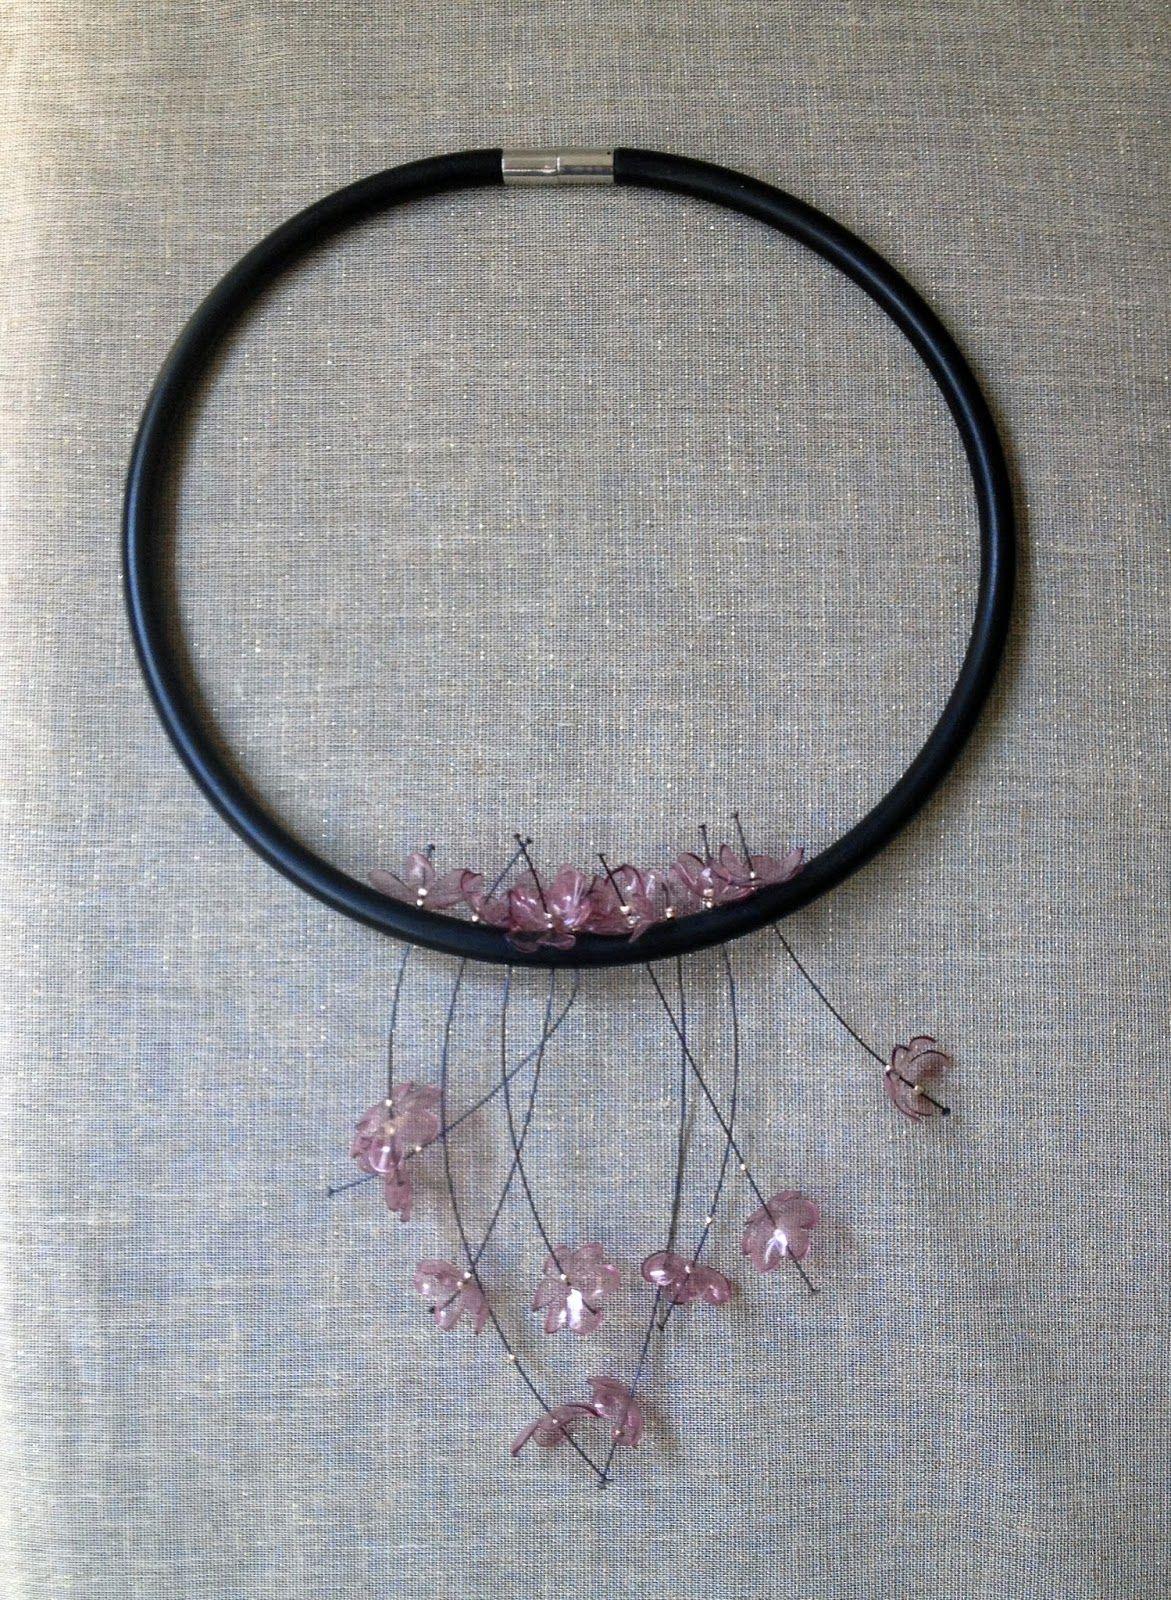 o ring necklace by gulnur ozdaglar, tertium non data | MY WORK ...